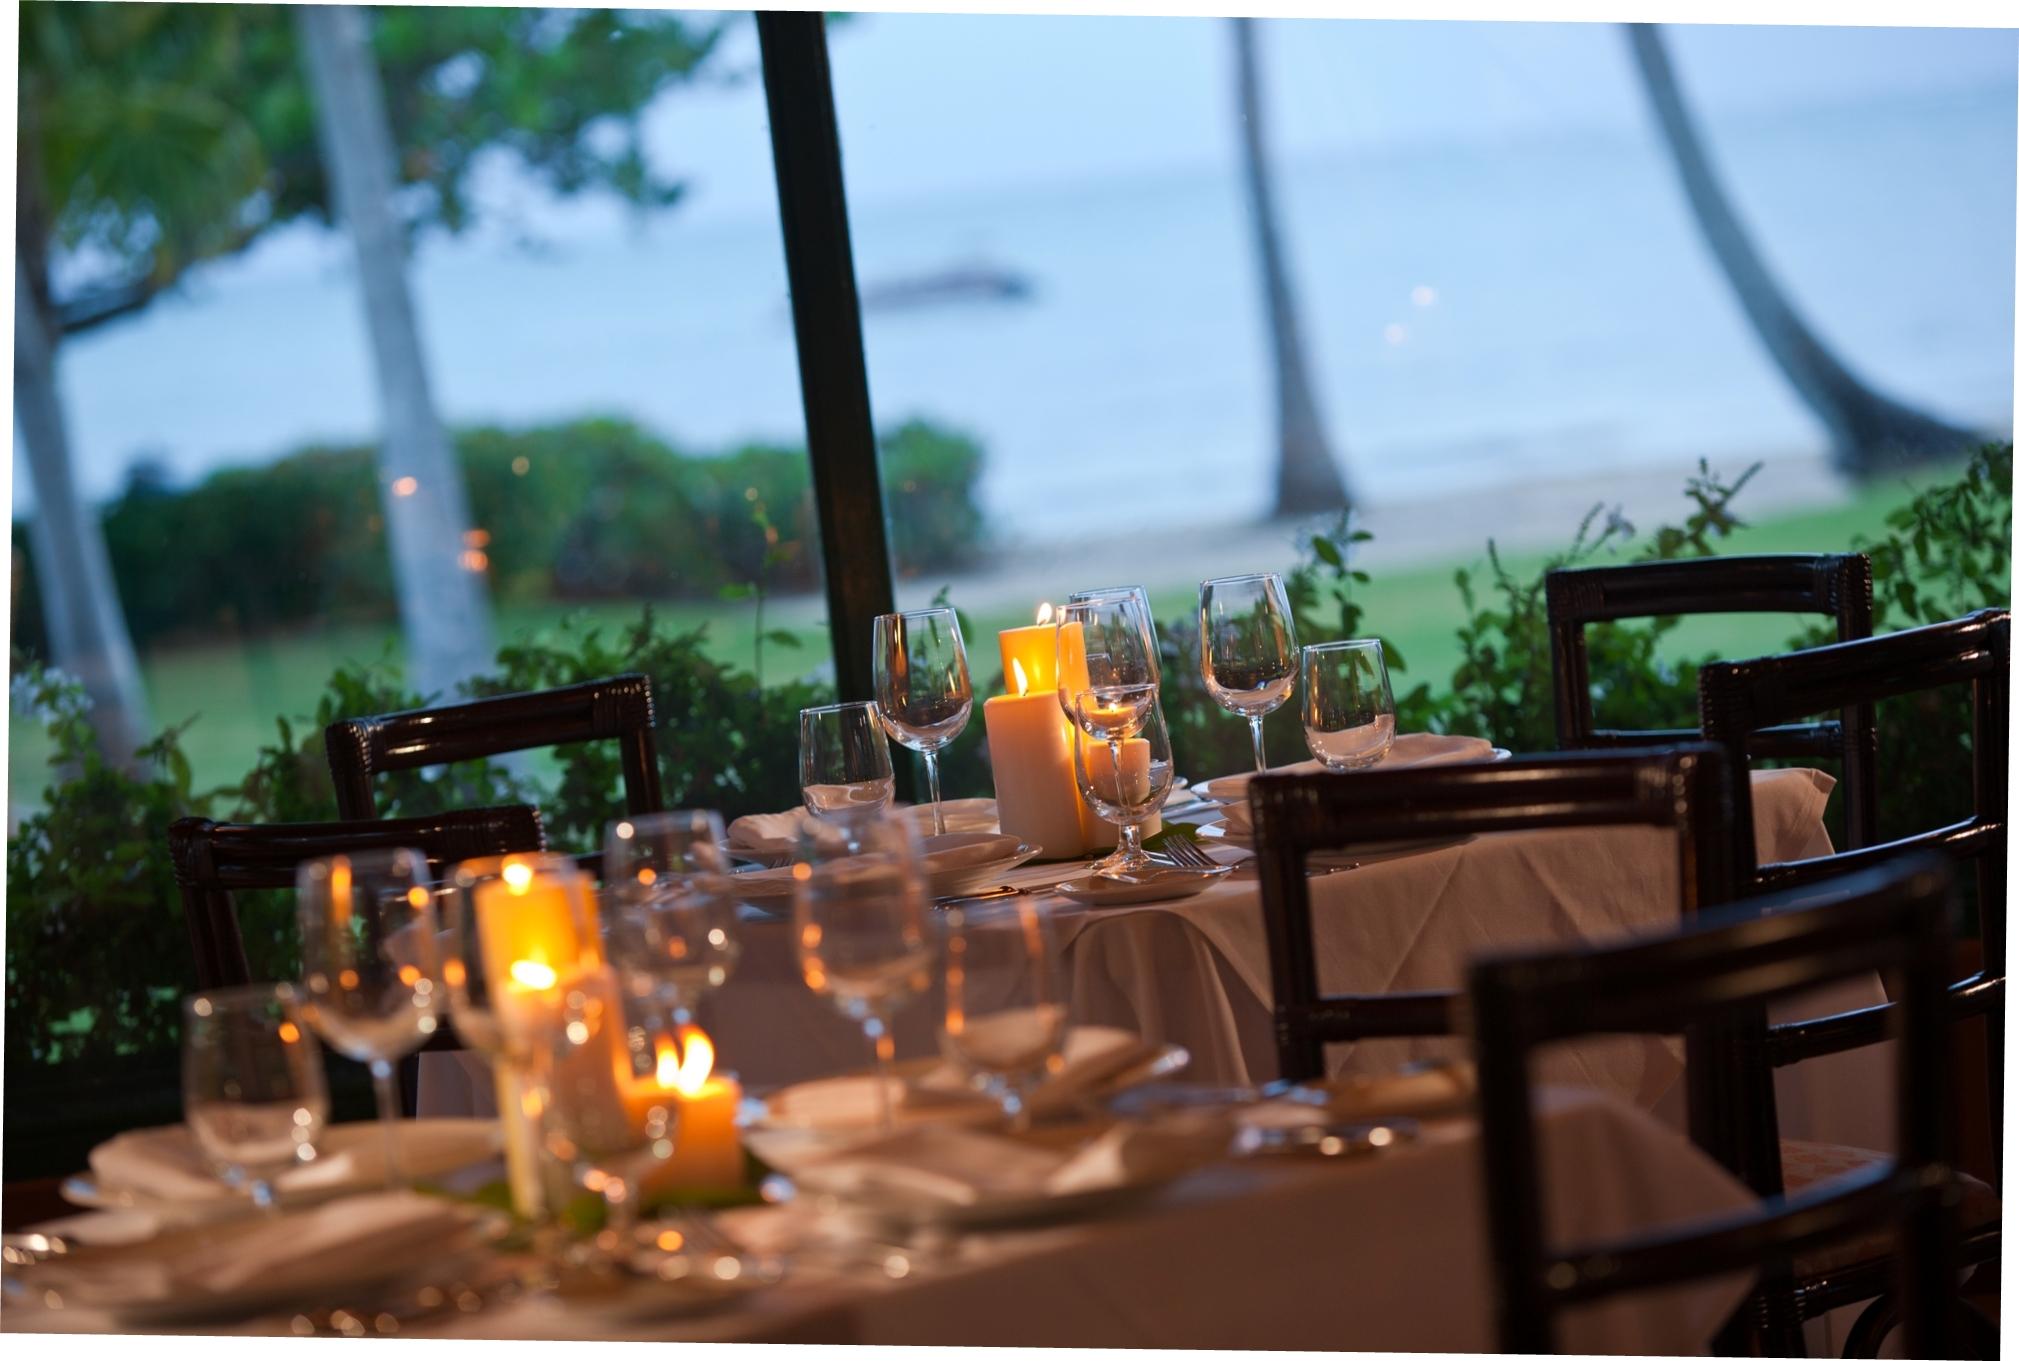 Chefs hoteleras en jornada gastronómica en Copamarina